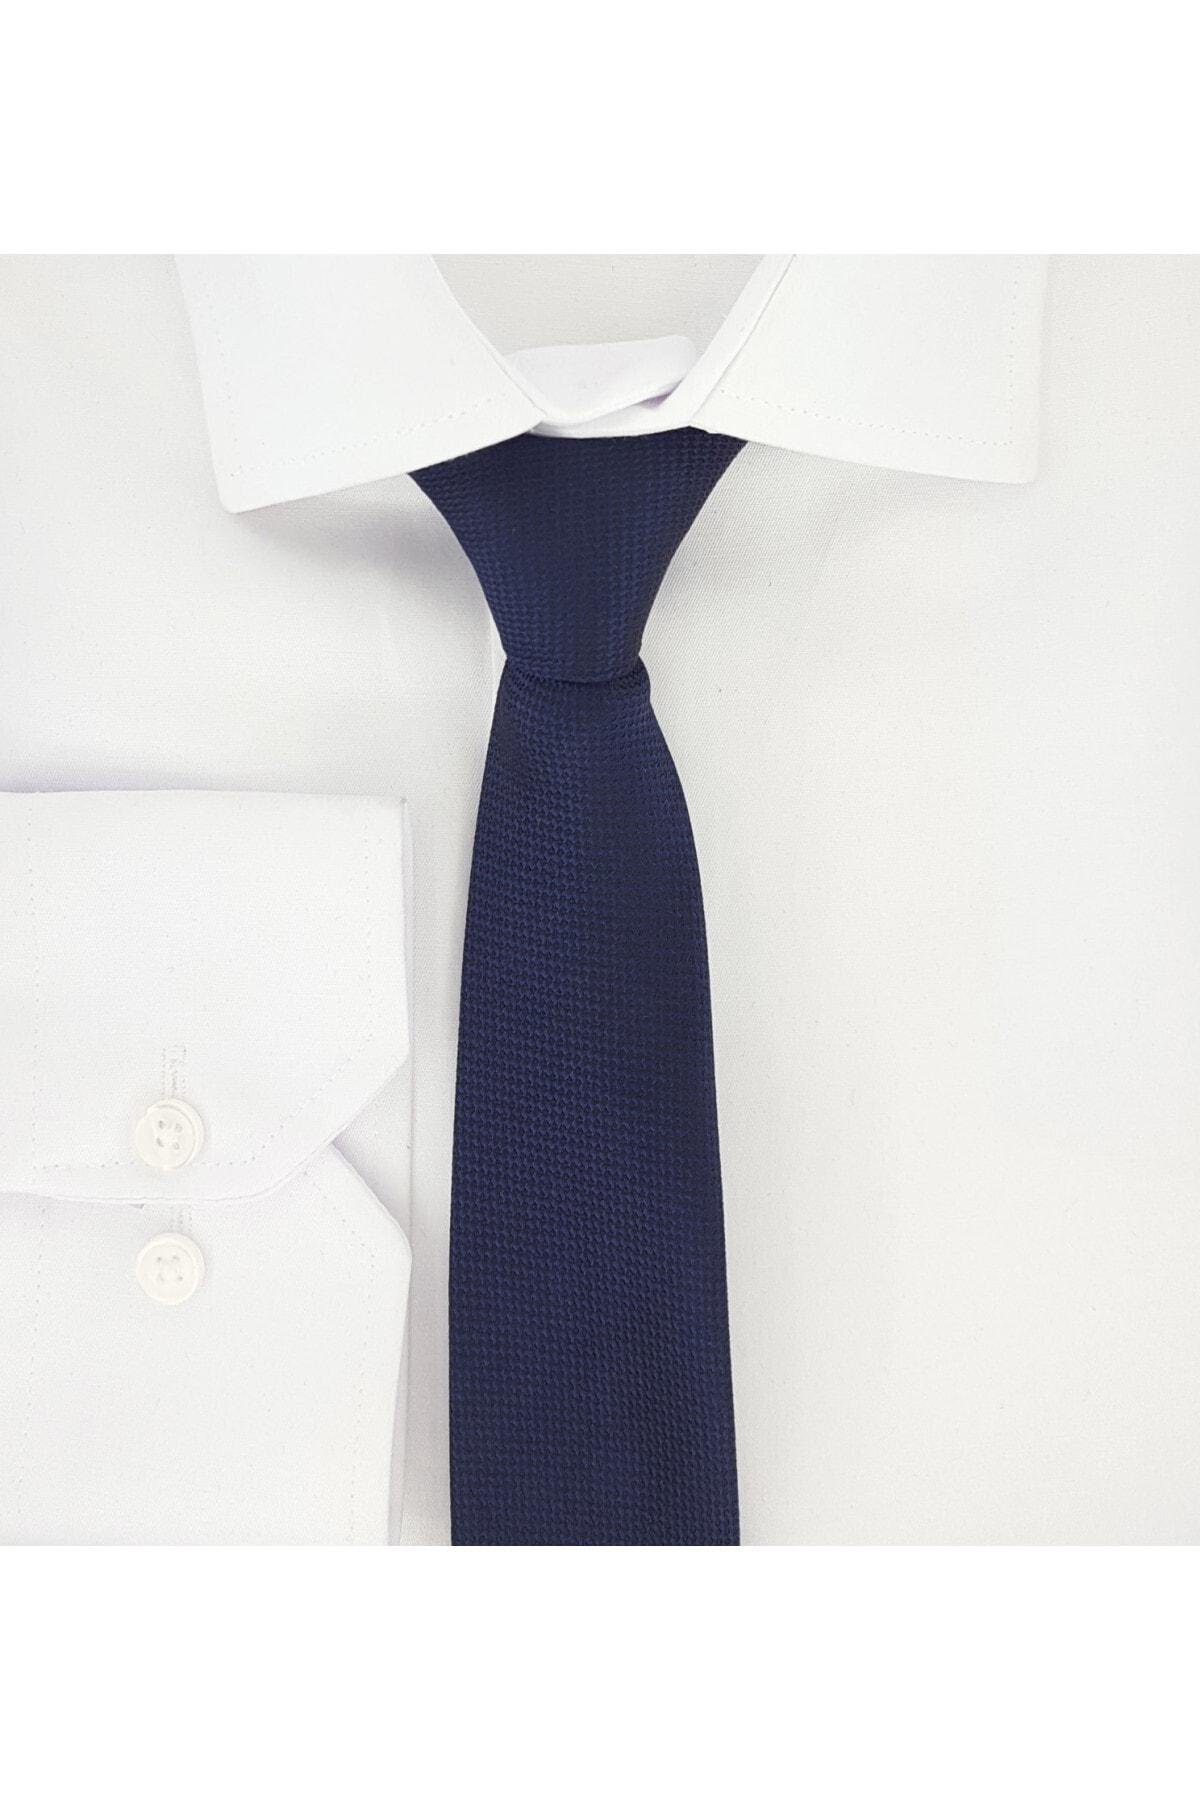 Elegante Cravatte Lacivert Renginde Armürlü Dokuma Kravat Ve Mendil 2